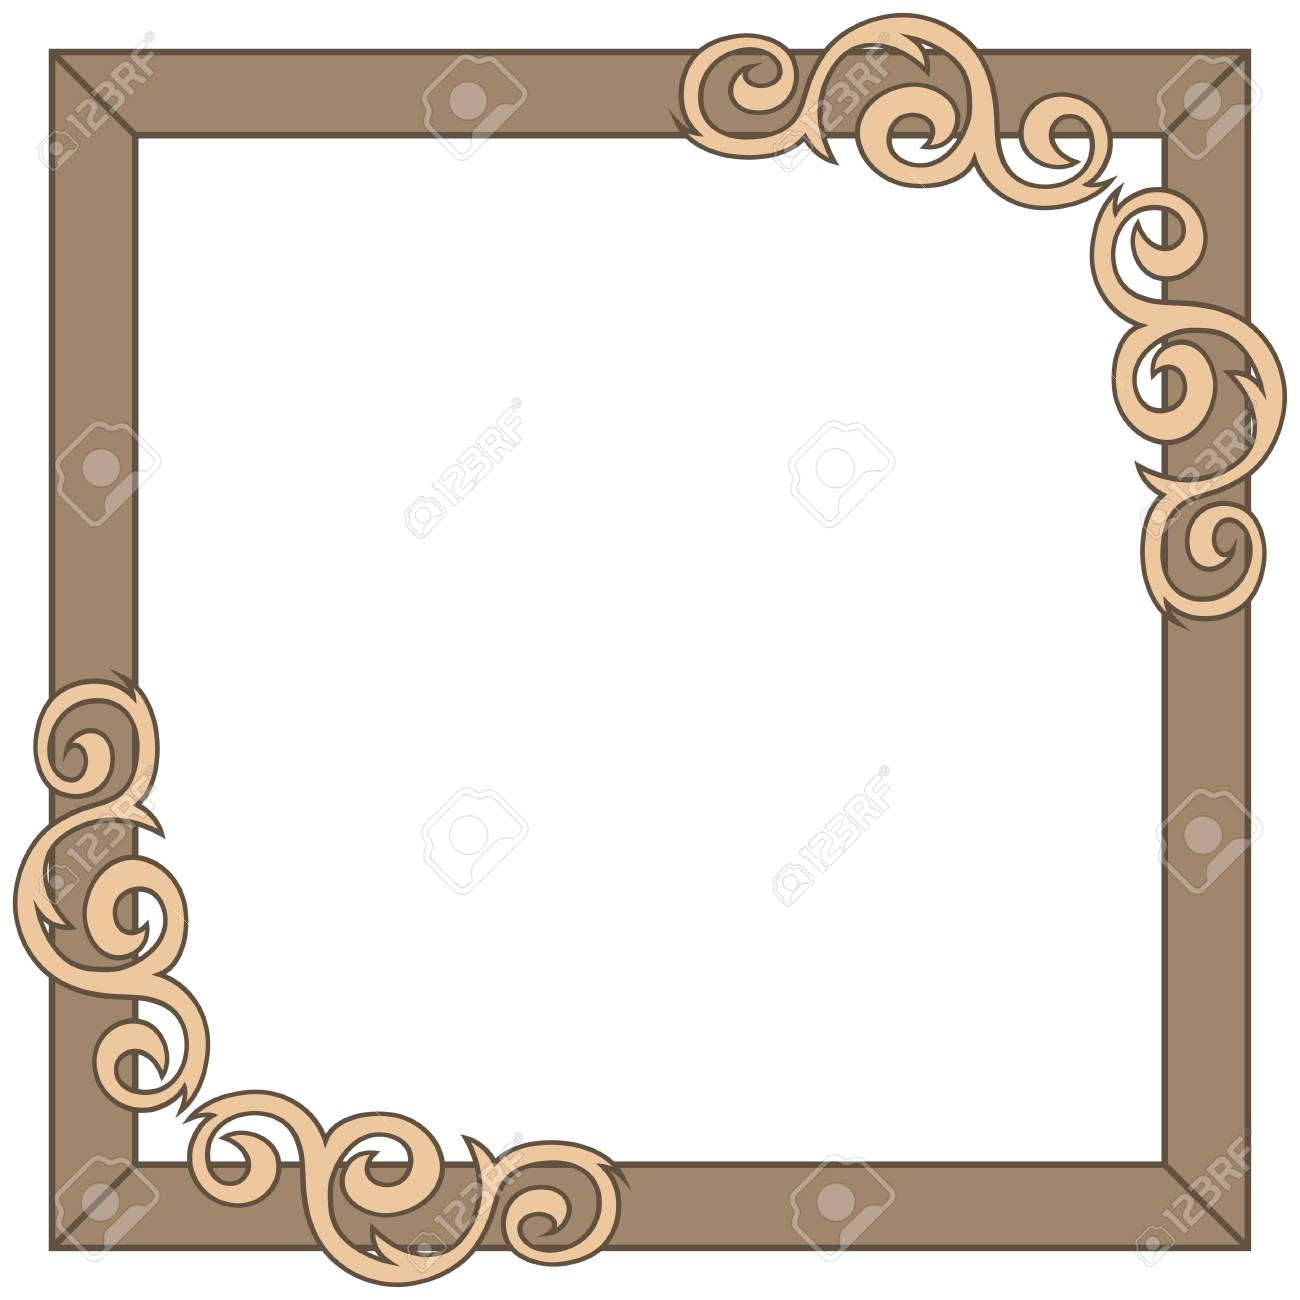 decorative ornate frame vector illustration royalty free cliparts